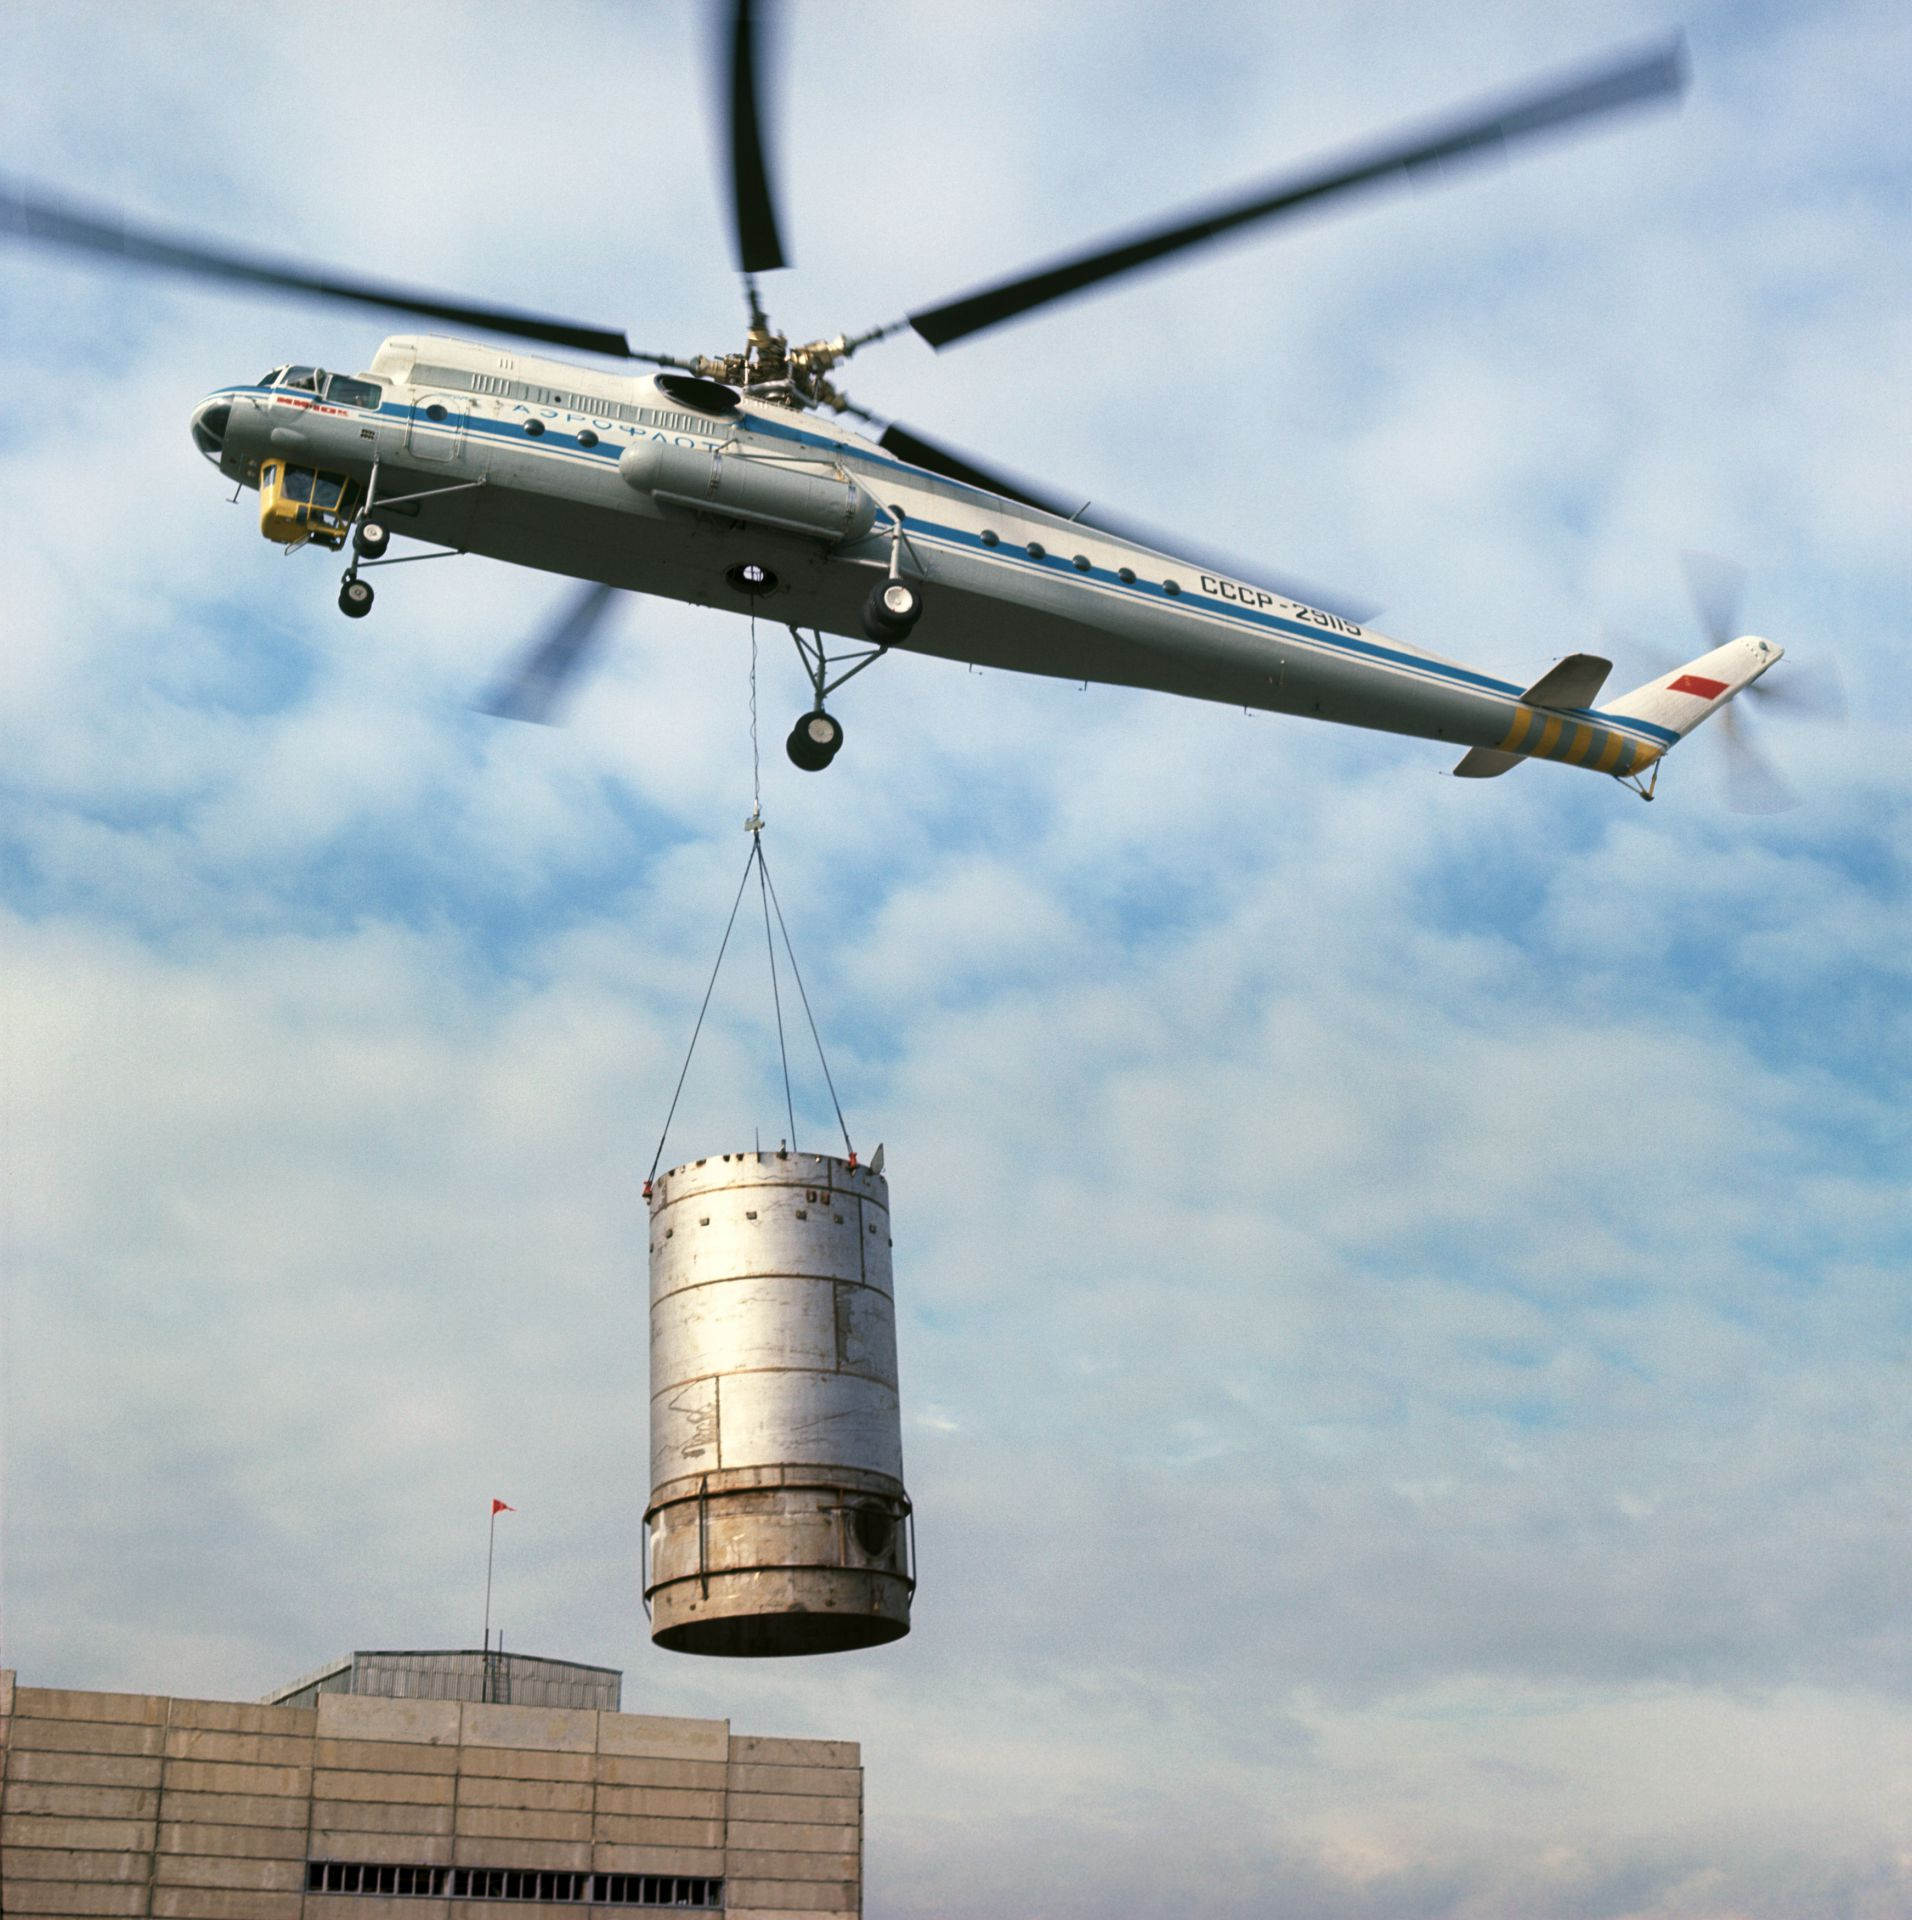 Транспортный вертолёт летающий кран Ми-10